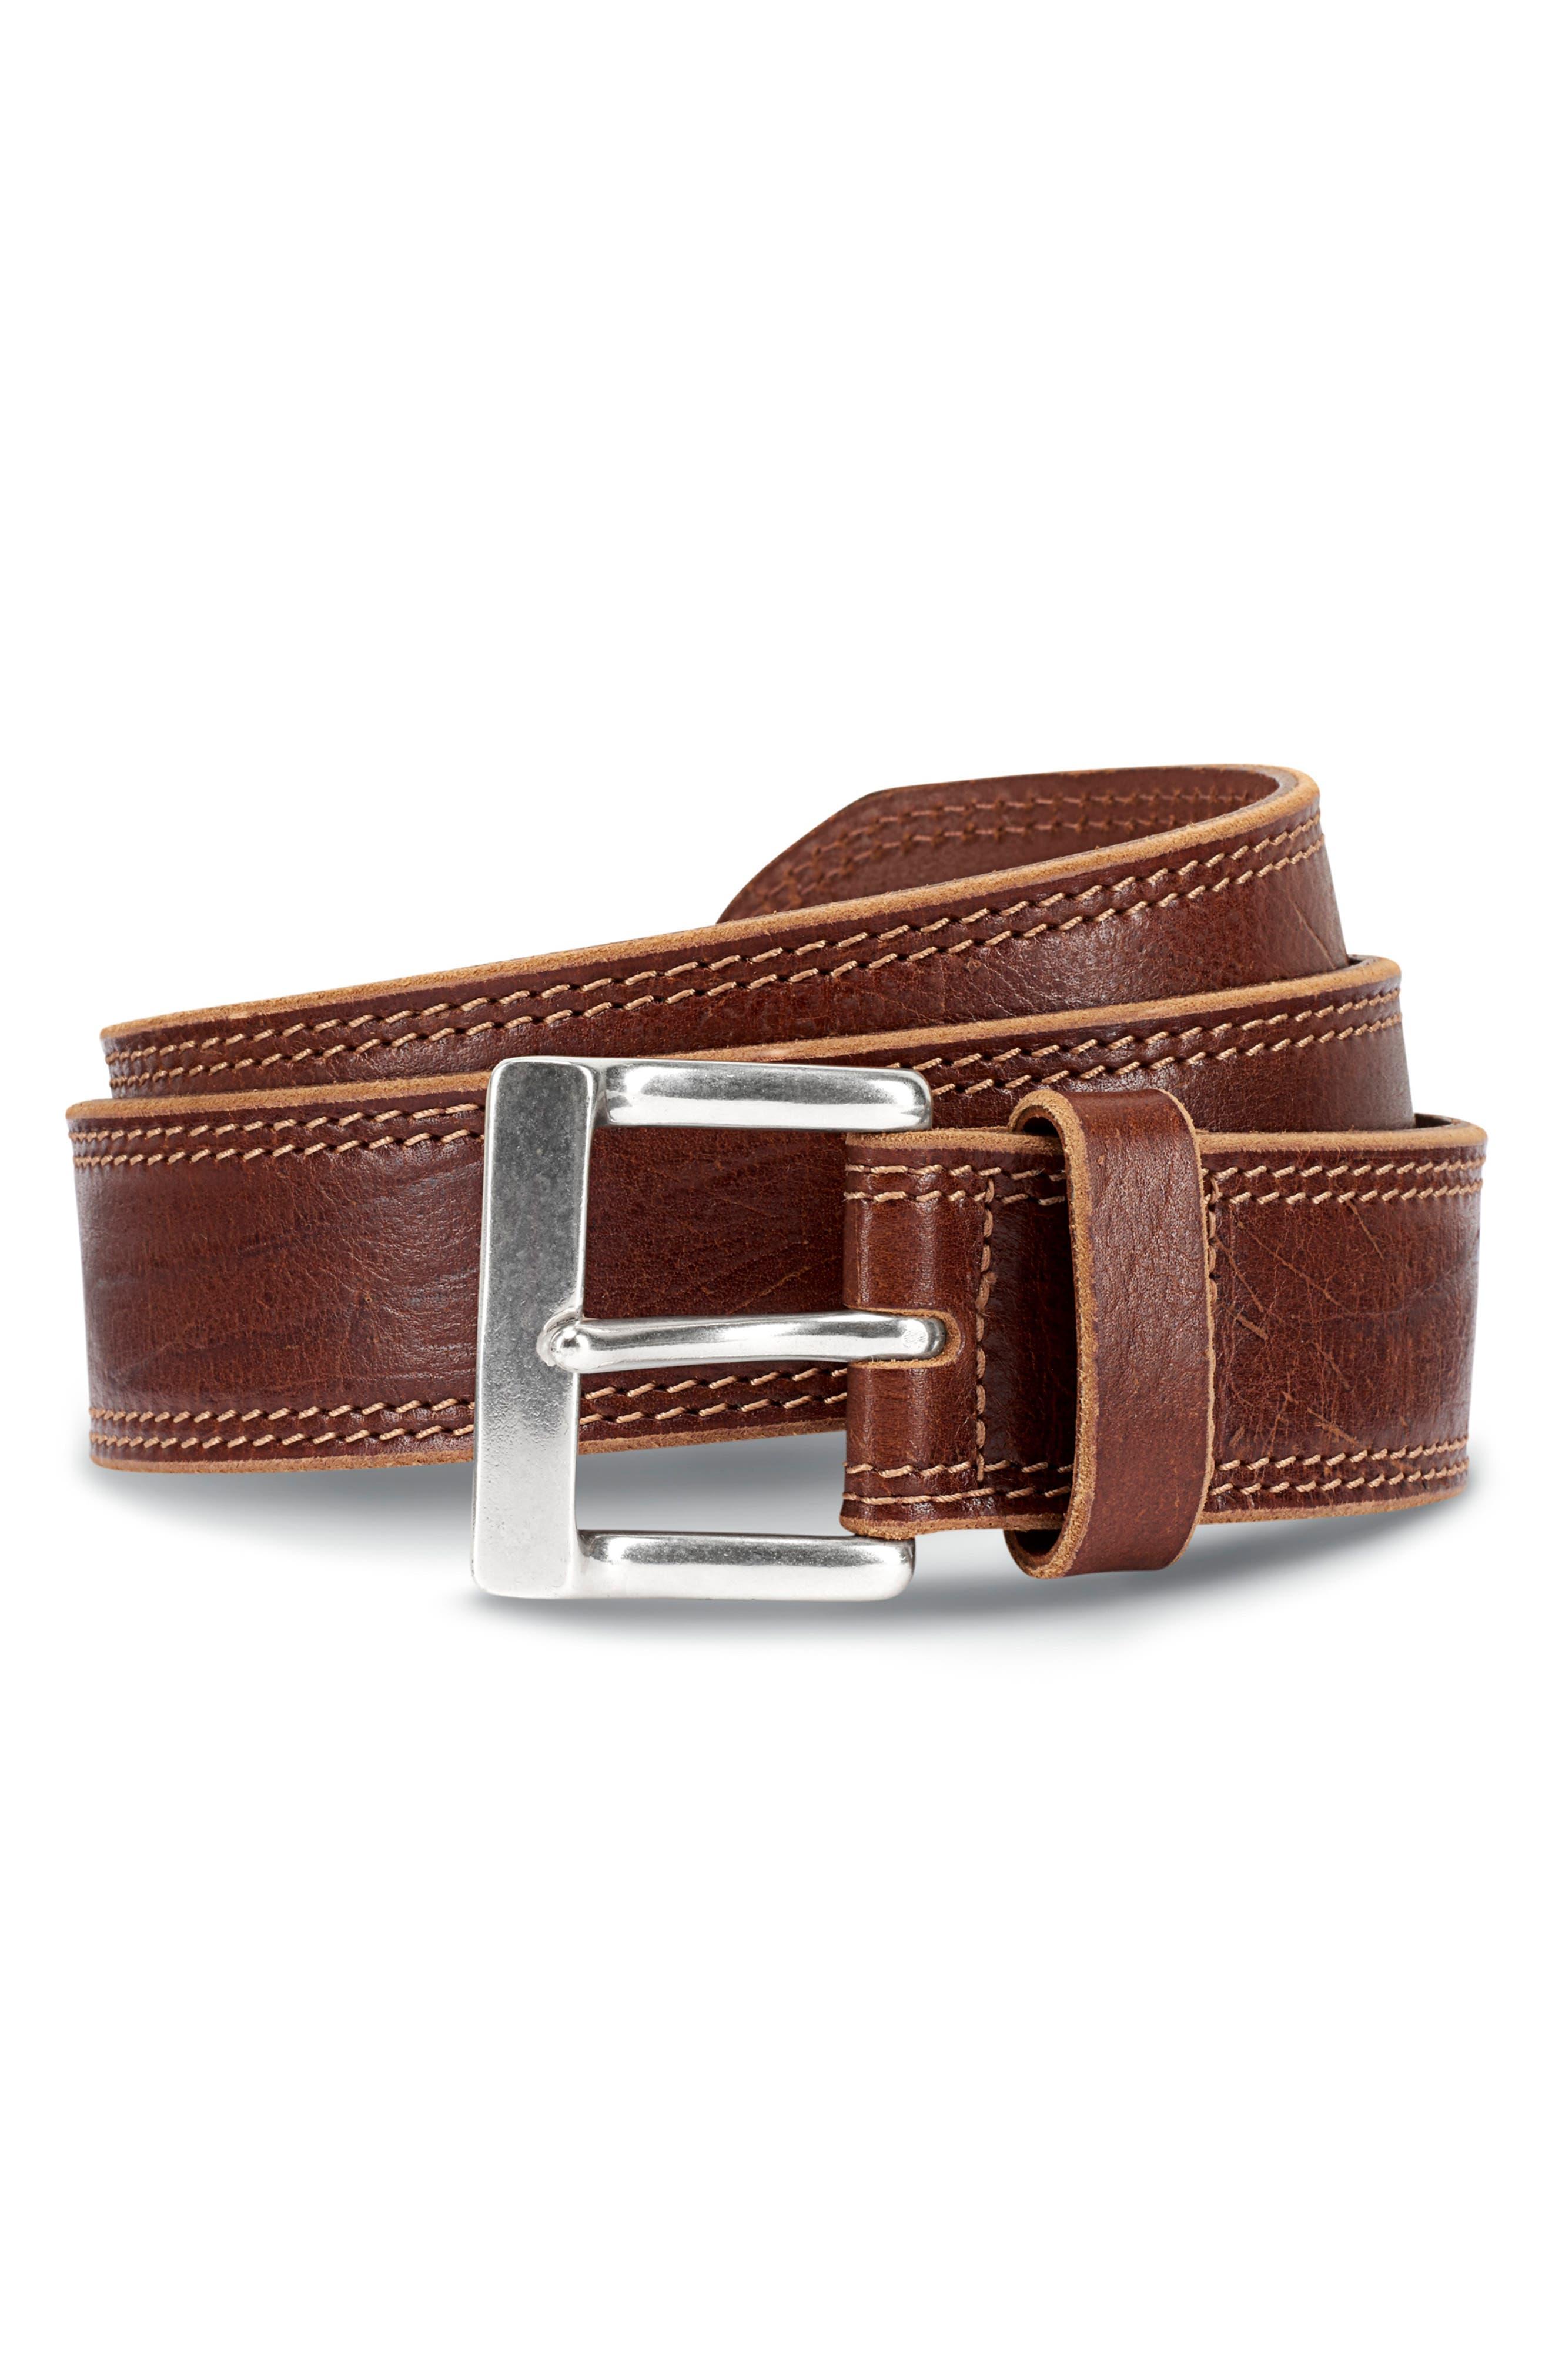 Allen Edmonds Quay Avenue Leather Belt, Tan